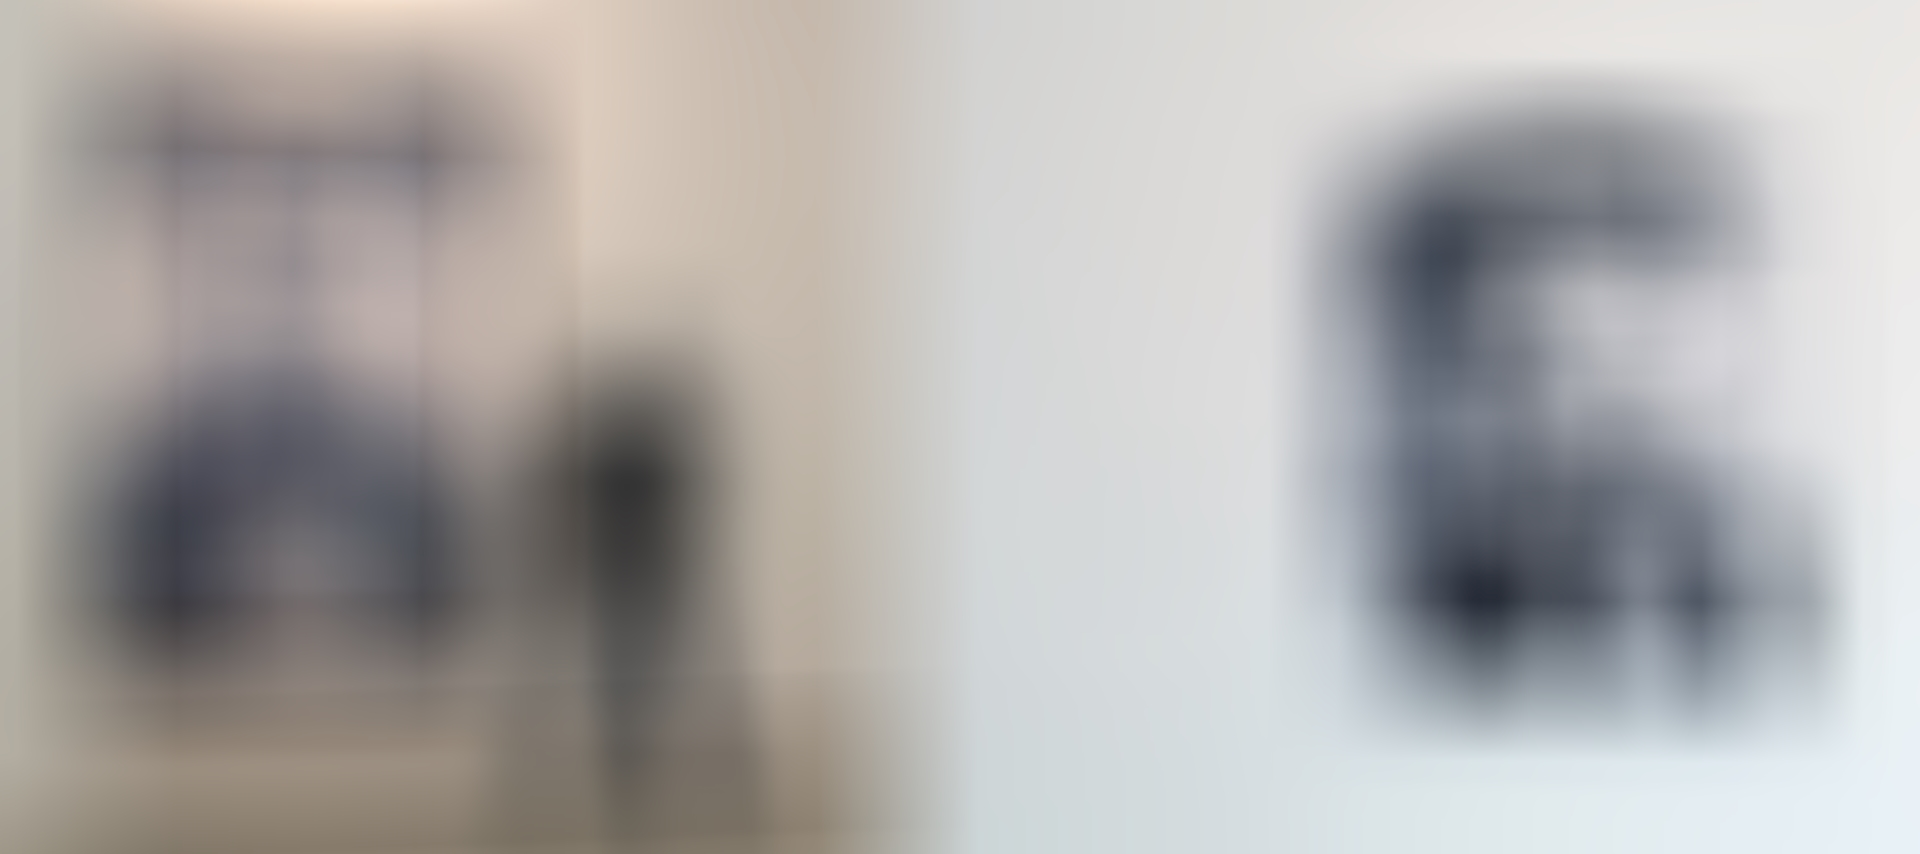 Vik Muniz: Pictures of People: Installation shot by Colin Davison